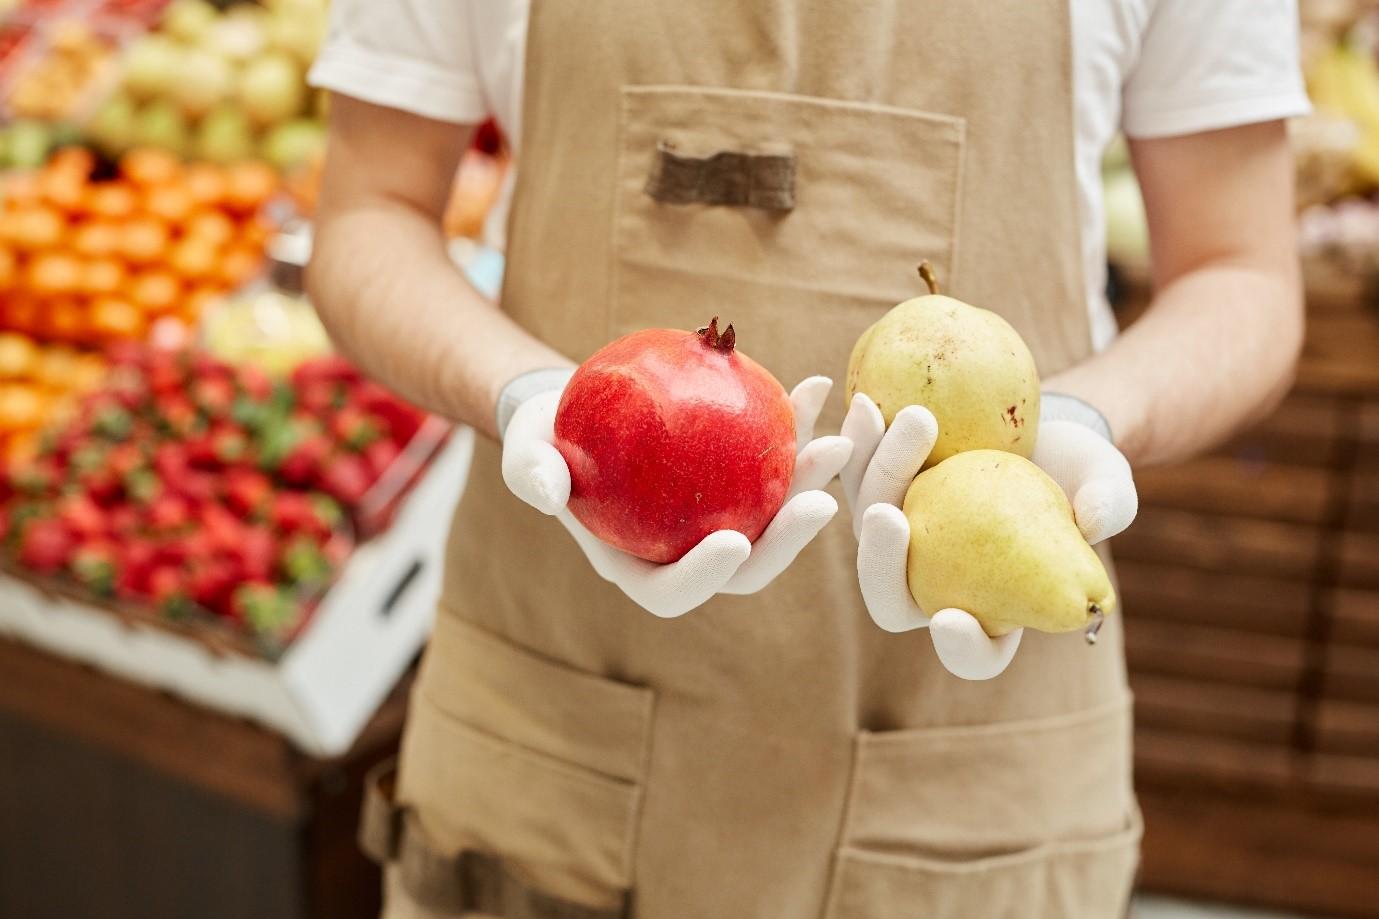 Merchant fruits